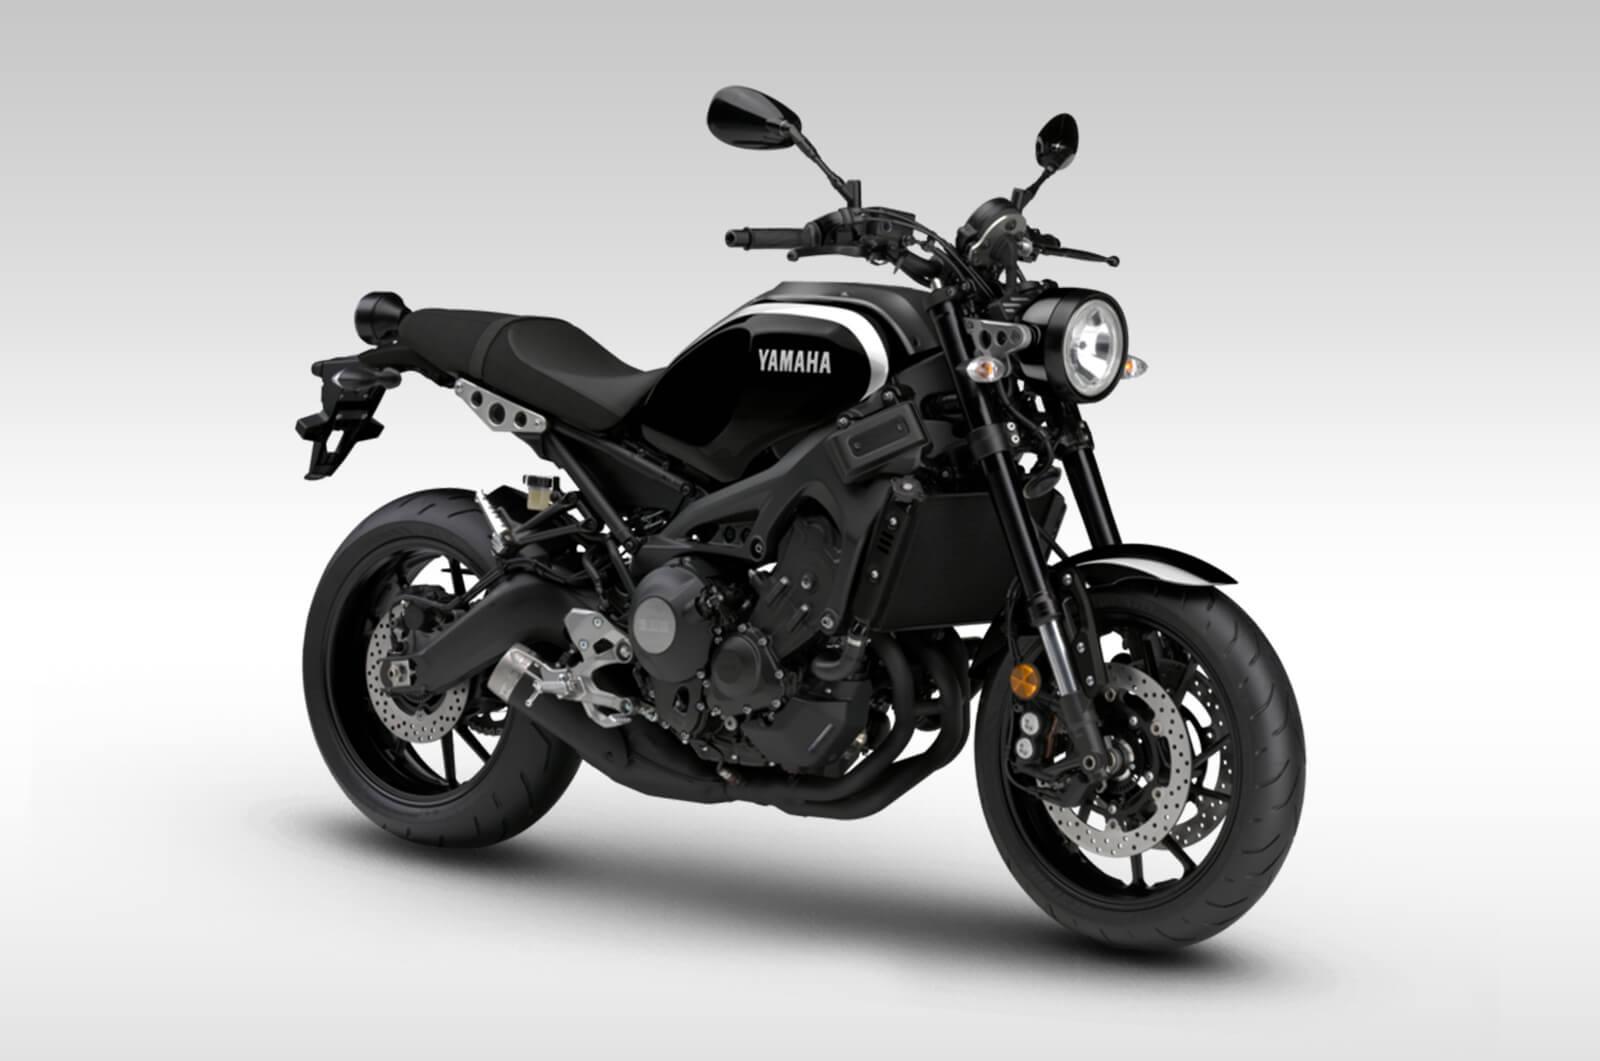 Yamaha xsr900 black